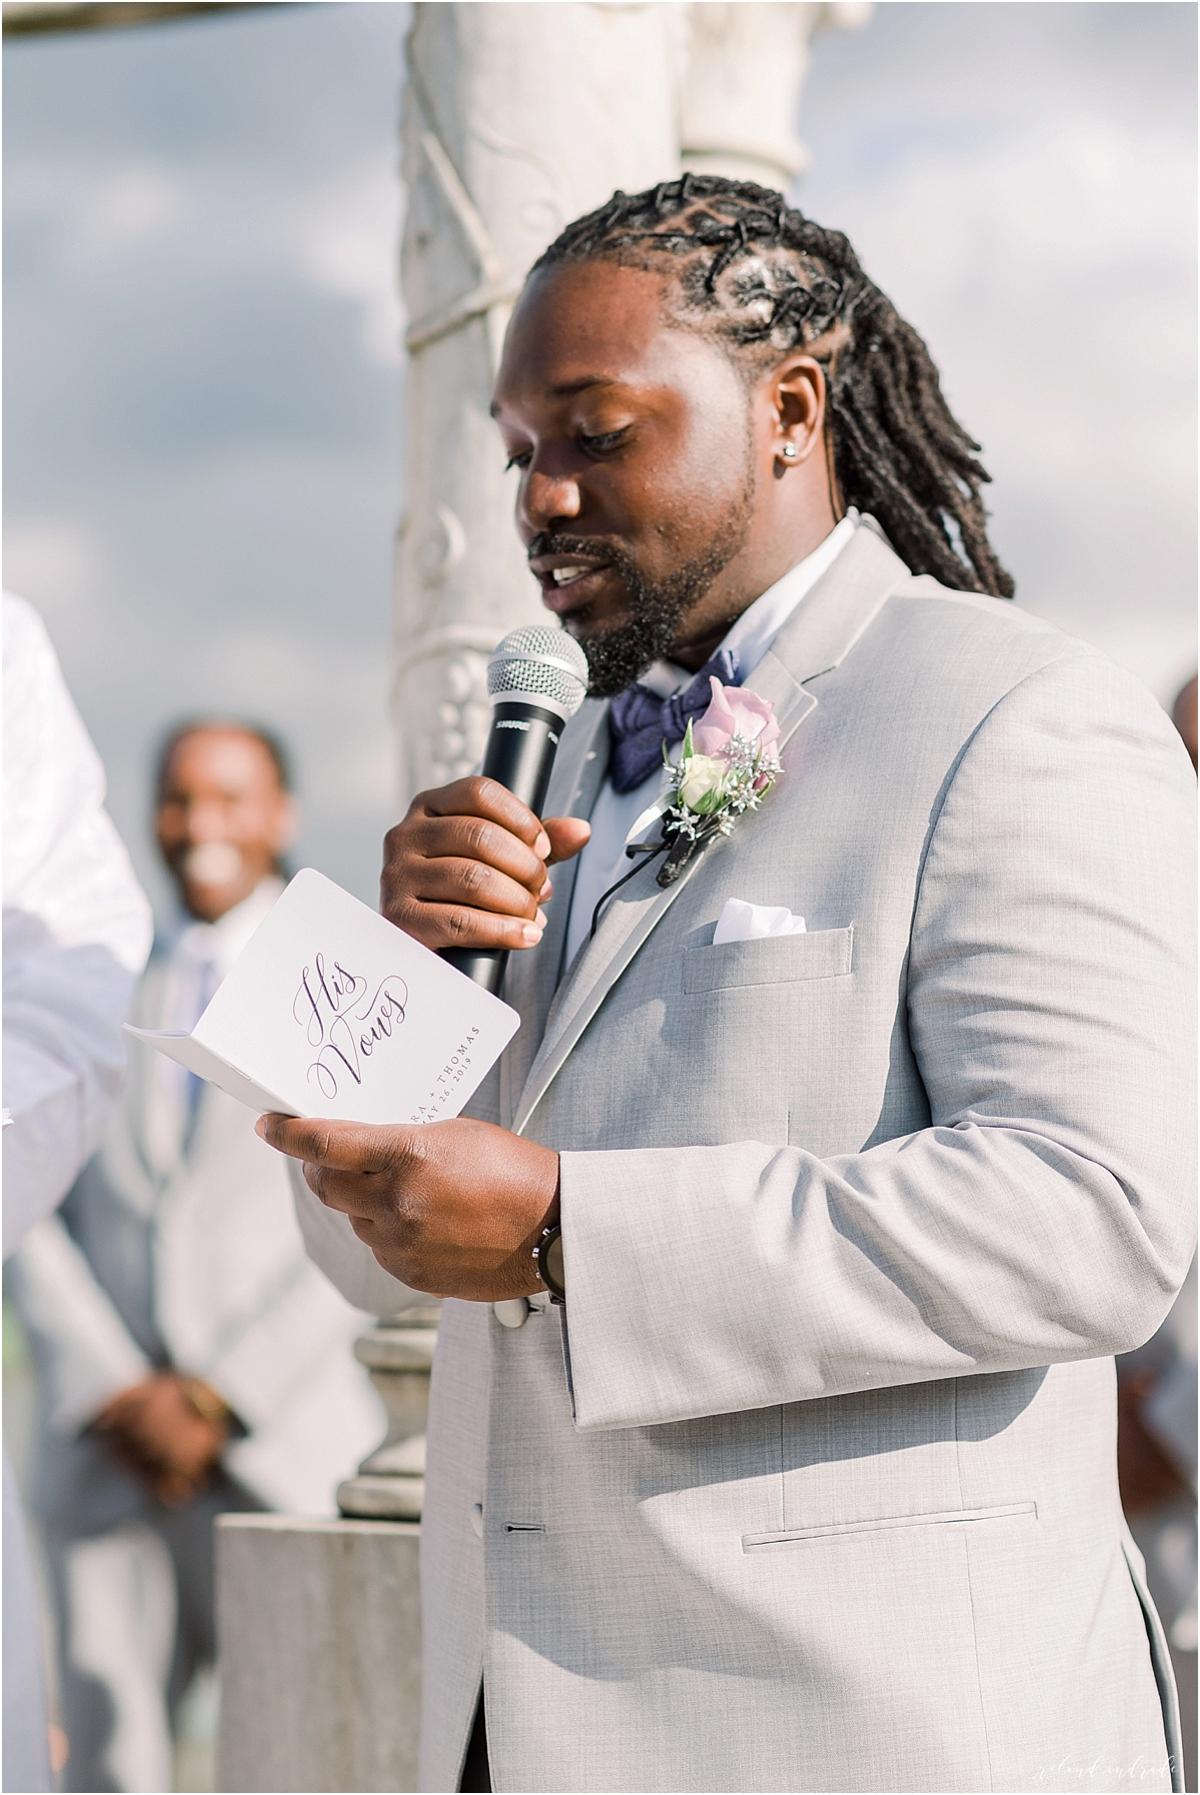 The Odyssey Wedding, Tinley Park Wedding, Chicago Wedding Photographer, Best Photographer In Tineley Park, Best Photographer In Chicago, Light And Airy Photographer_0041.jpg